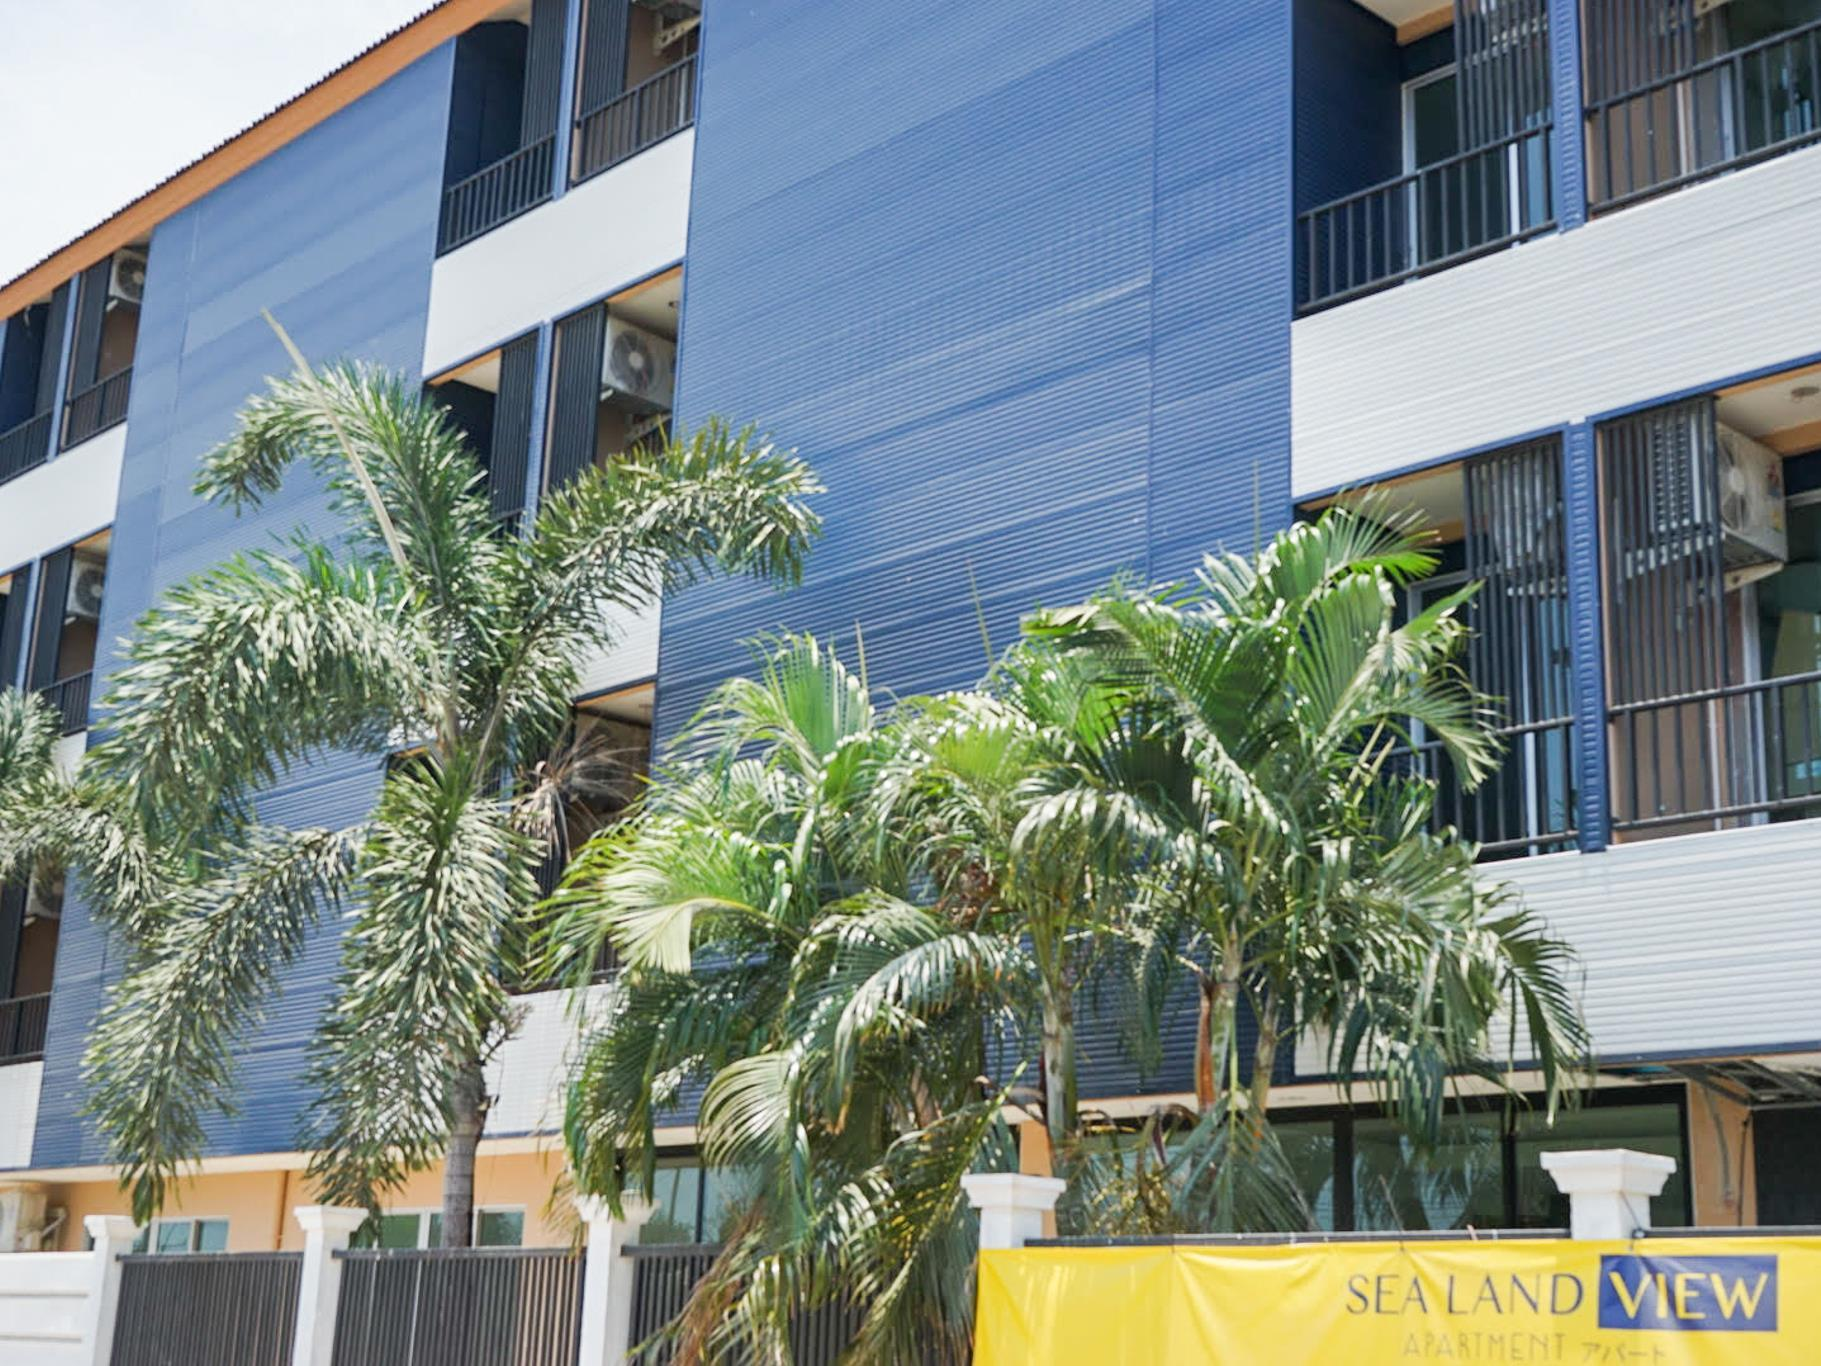 Sea Land View Apartment Sriracha Chonburi Thailand